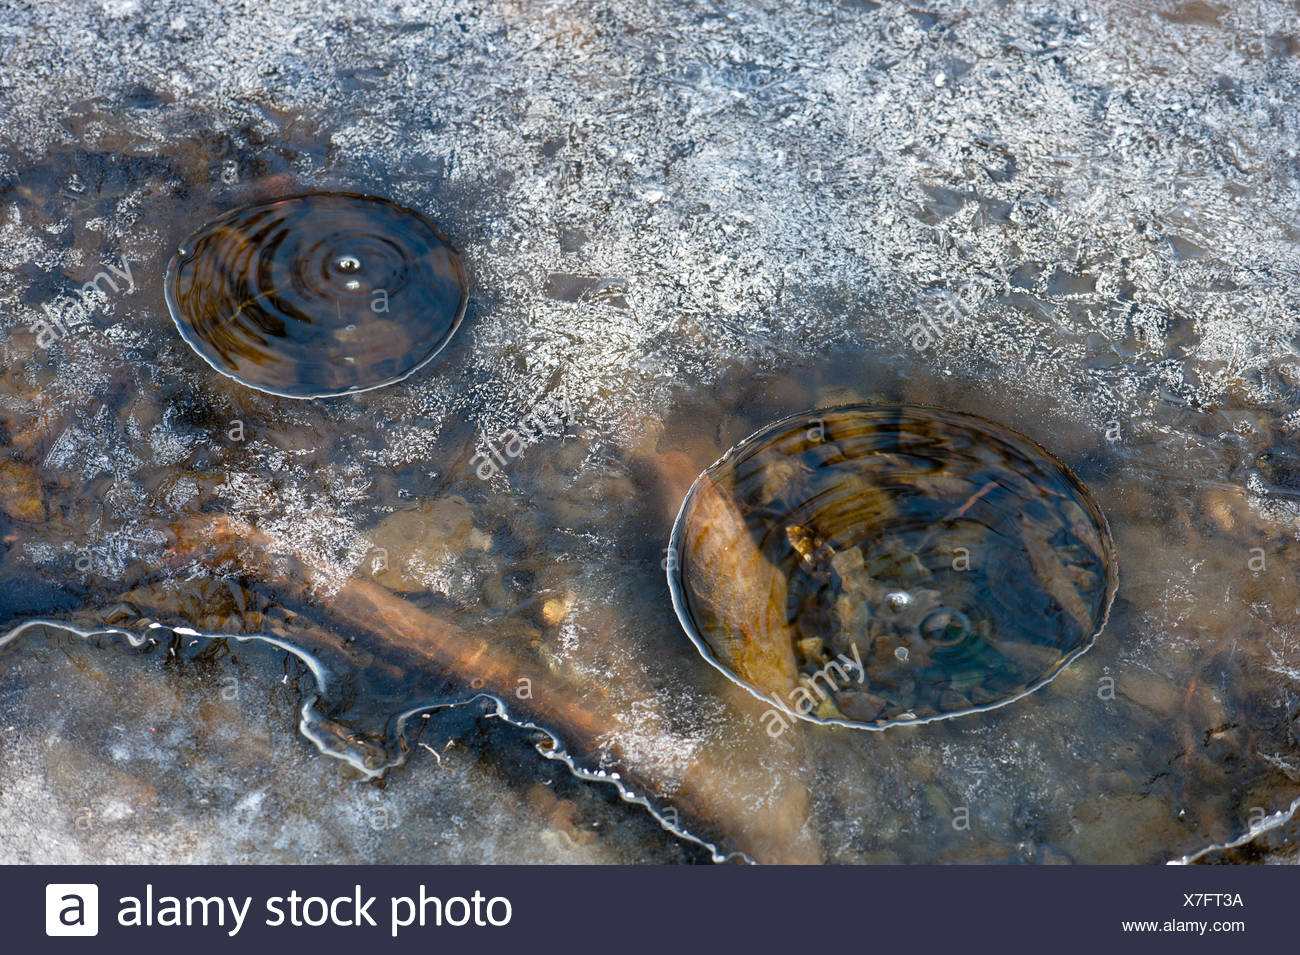 Bubbles, carbon dioxide escaping, mofette or mofettes, Laacher See, Laach Lake, Ahrweiler district, Eifel region - Stock Image